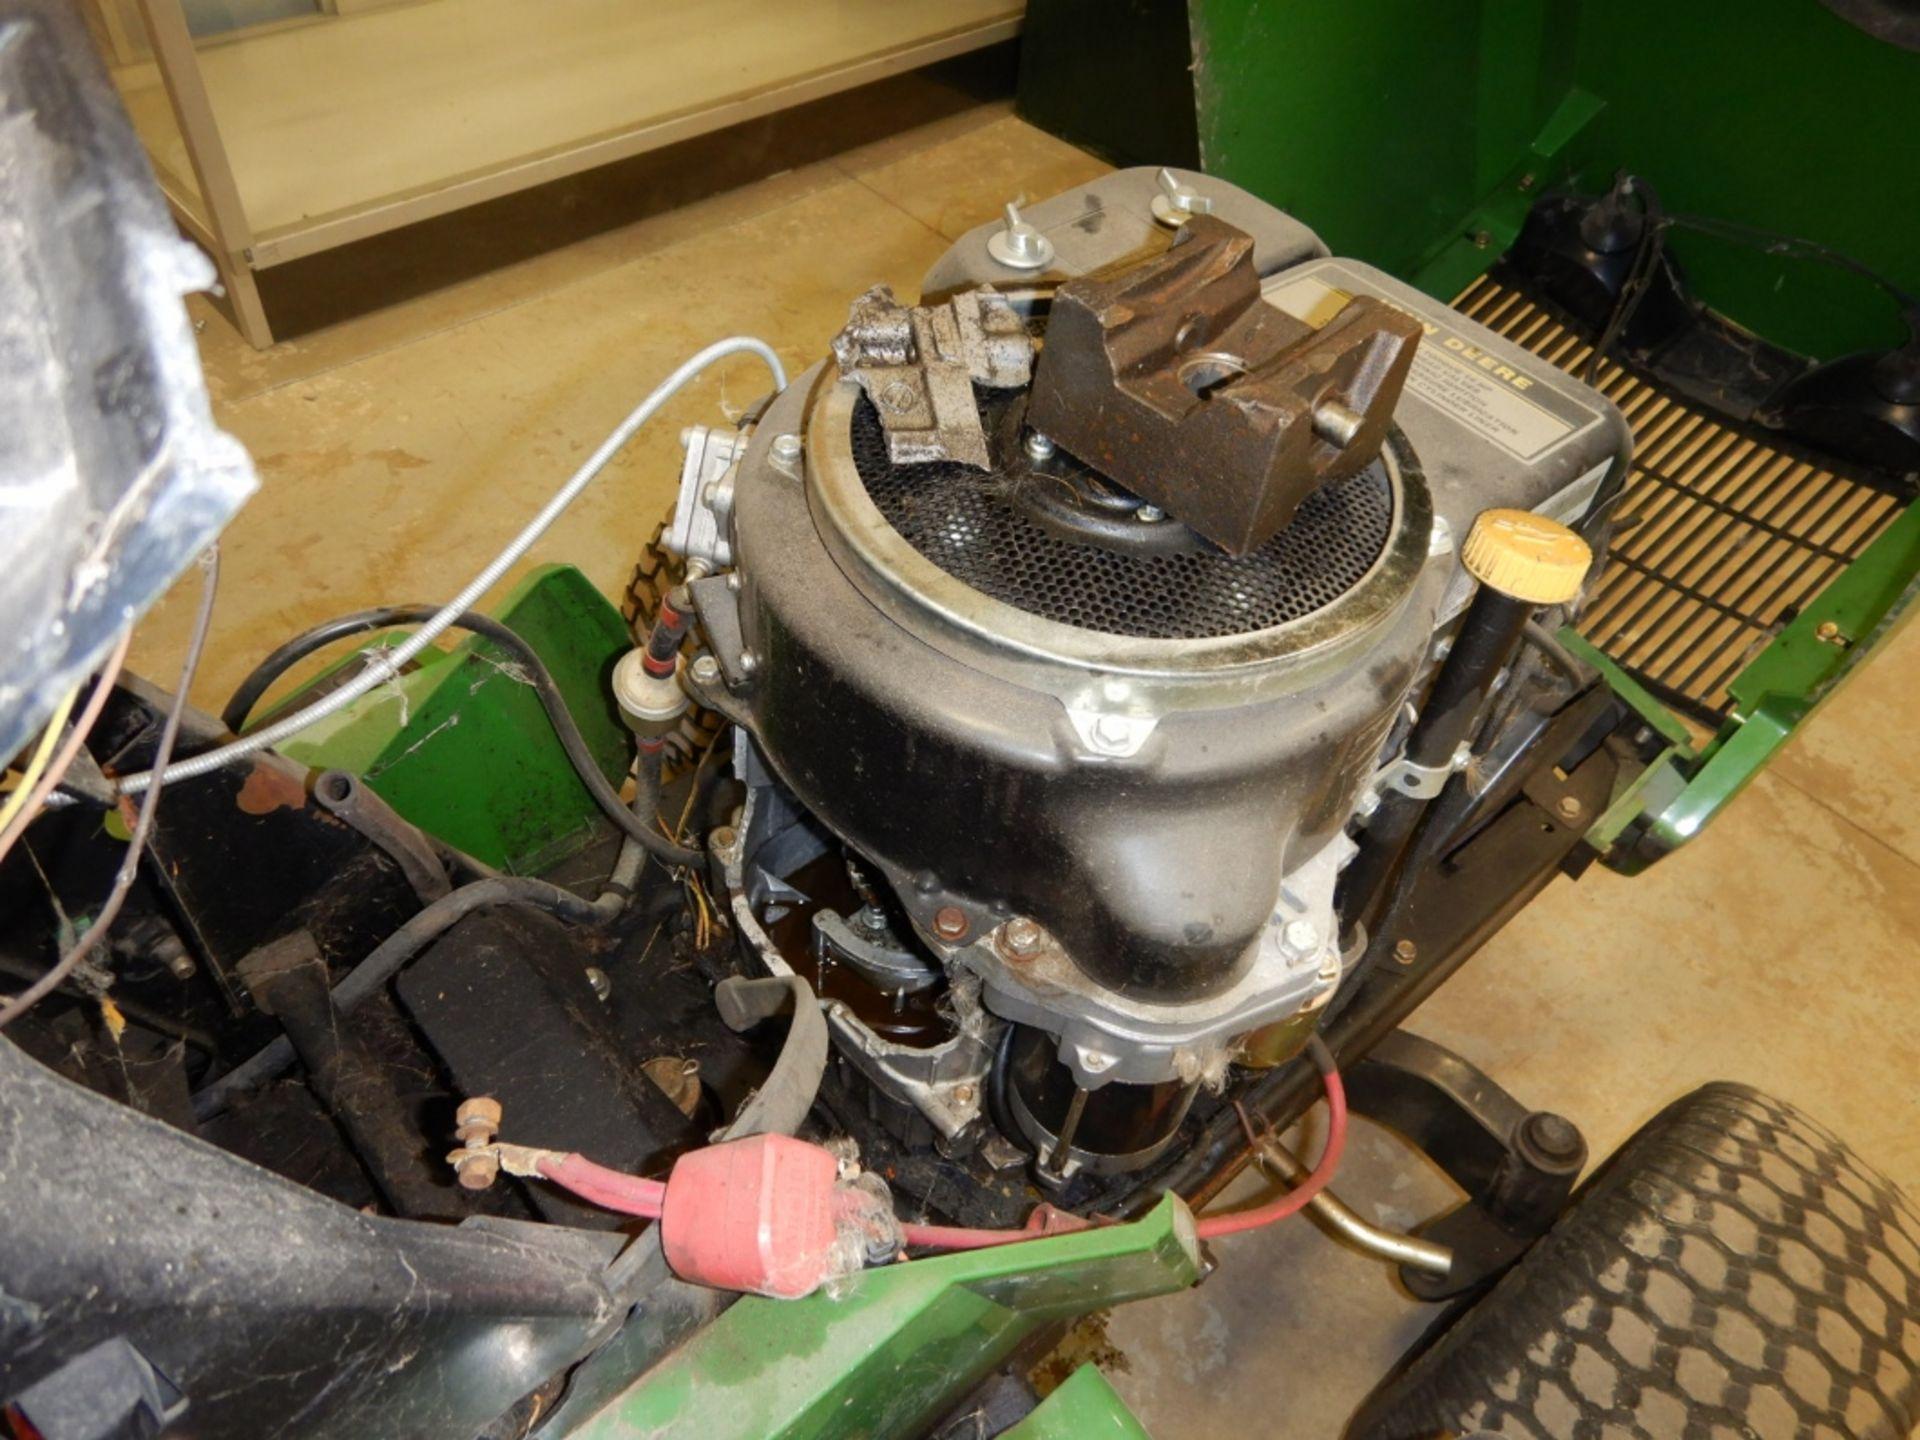 "JOHN DEERE LX136 LAWN TRACTOR W/ 38"" MULCHING DECK - INOPERABLE - HOLE IN ENGINE BLOCK - Image 4 of 4"